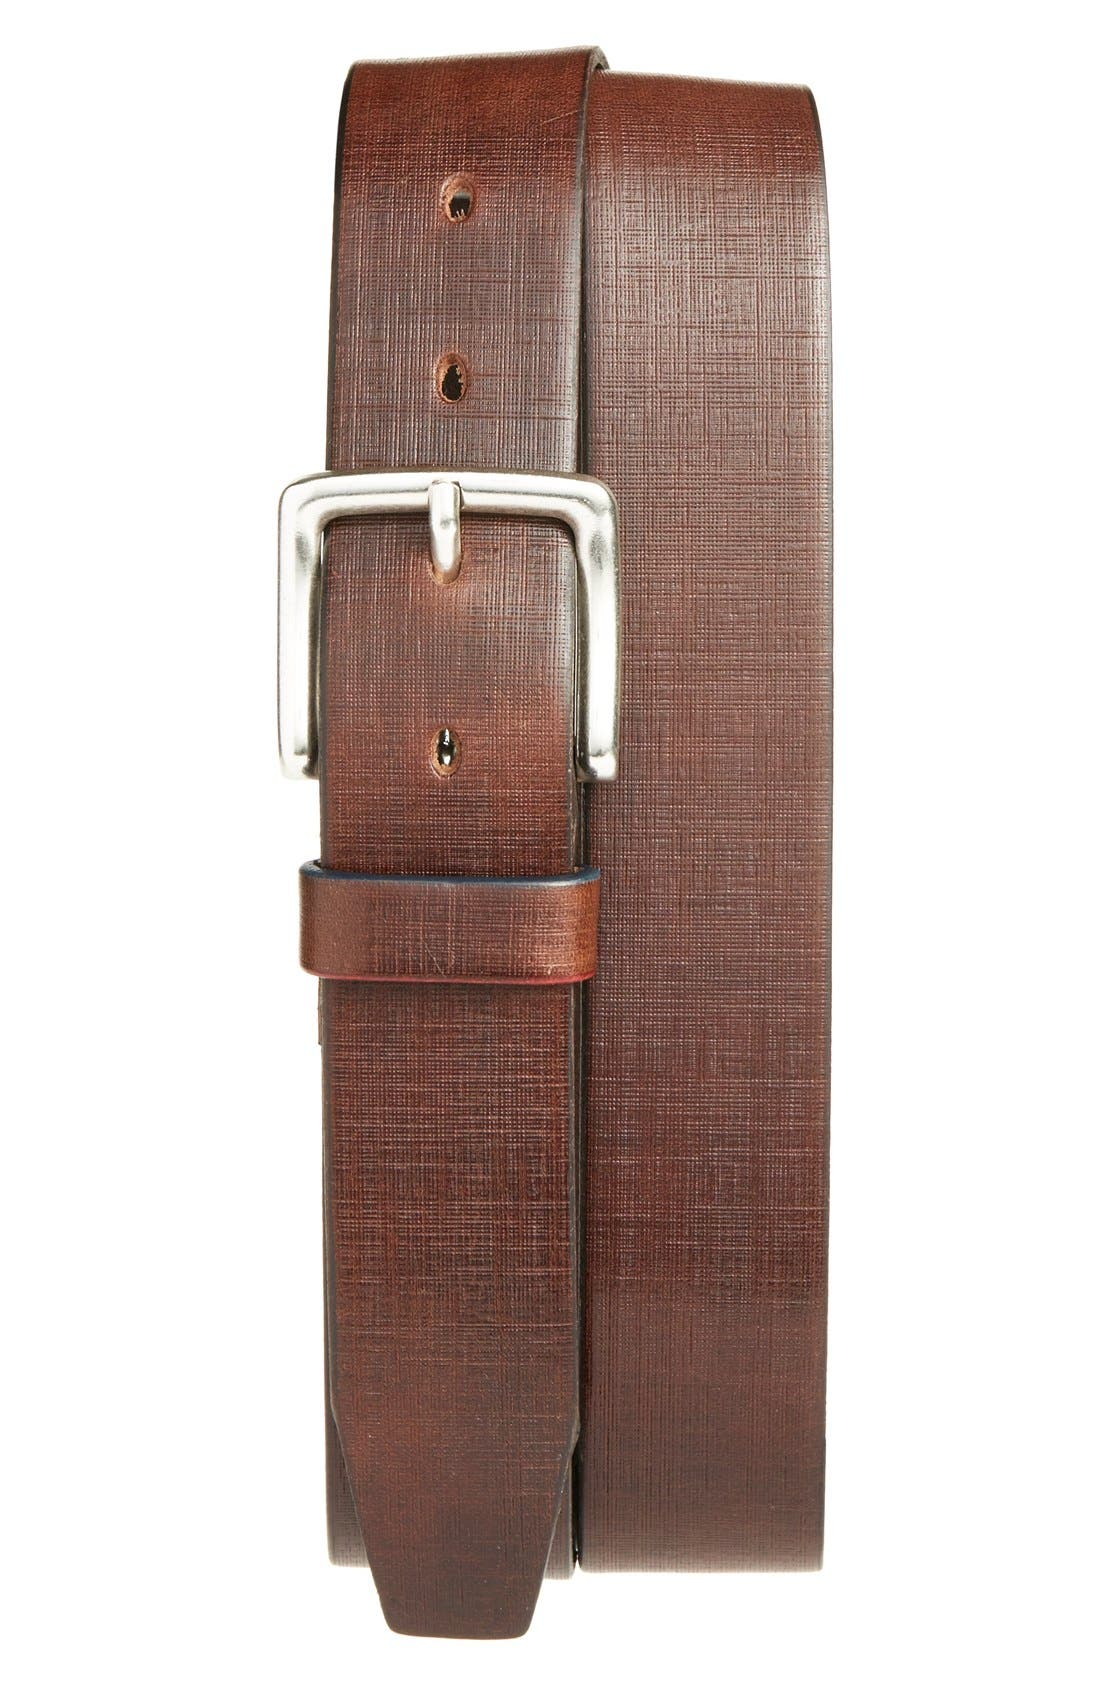 Alternate Image 1 Selected - Trafalgar Leather Belt